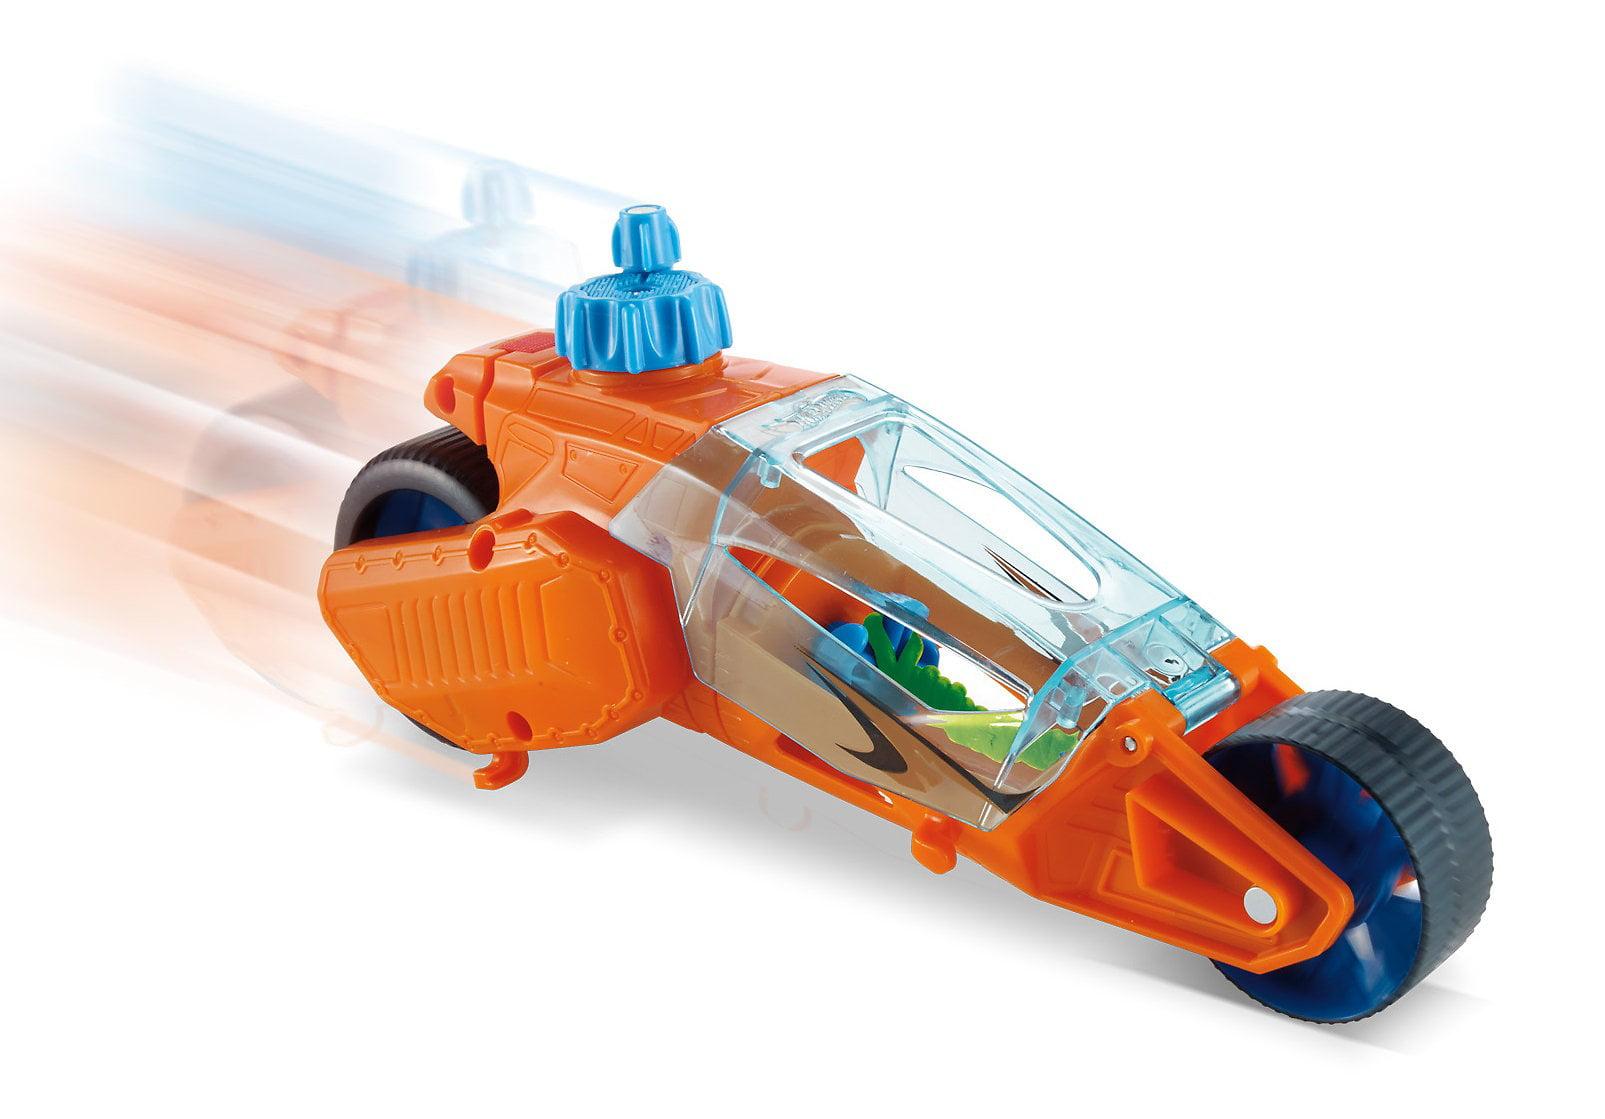 Hot Wheels Speed Winders Twisted Cycle Orange by Mattel